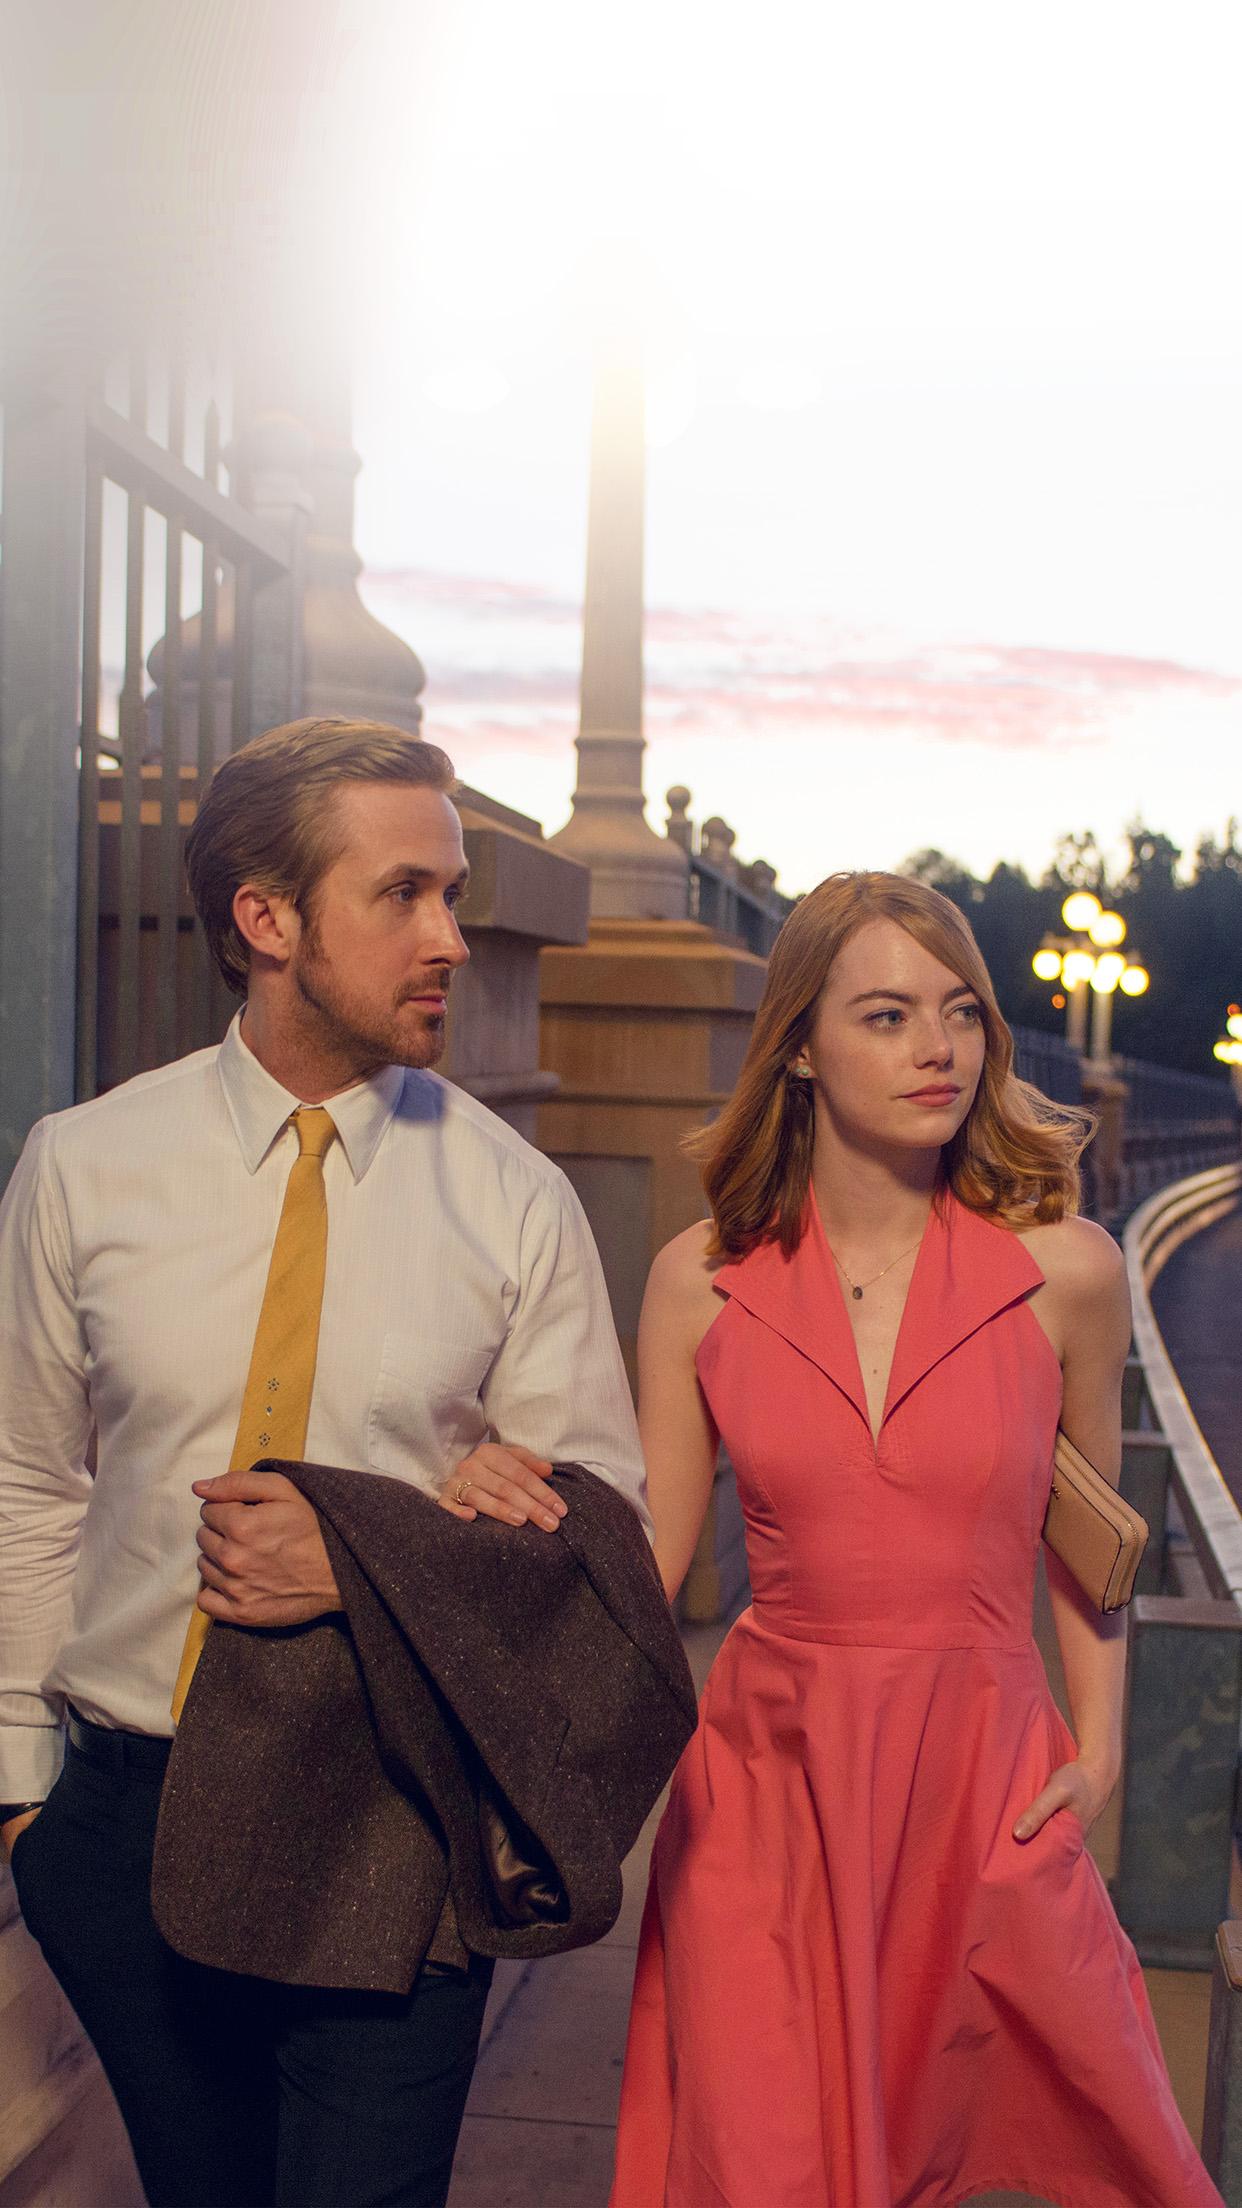 Car Wallpapers For Nexus 5 Hl40 Lalaland Ryan Gosling Emma Stone Red Film Wallpaper